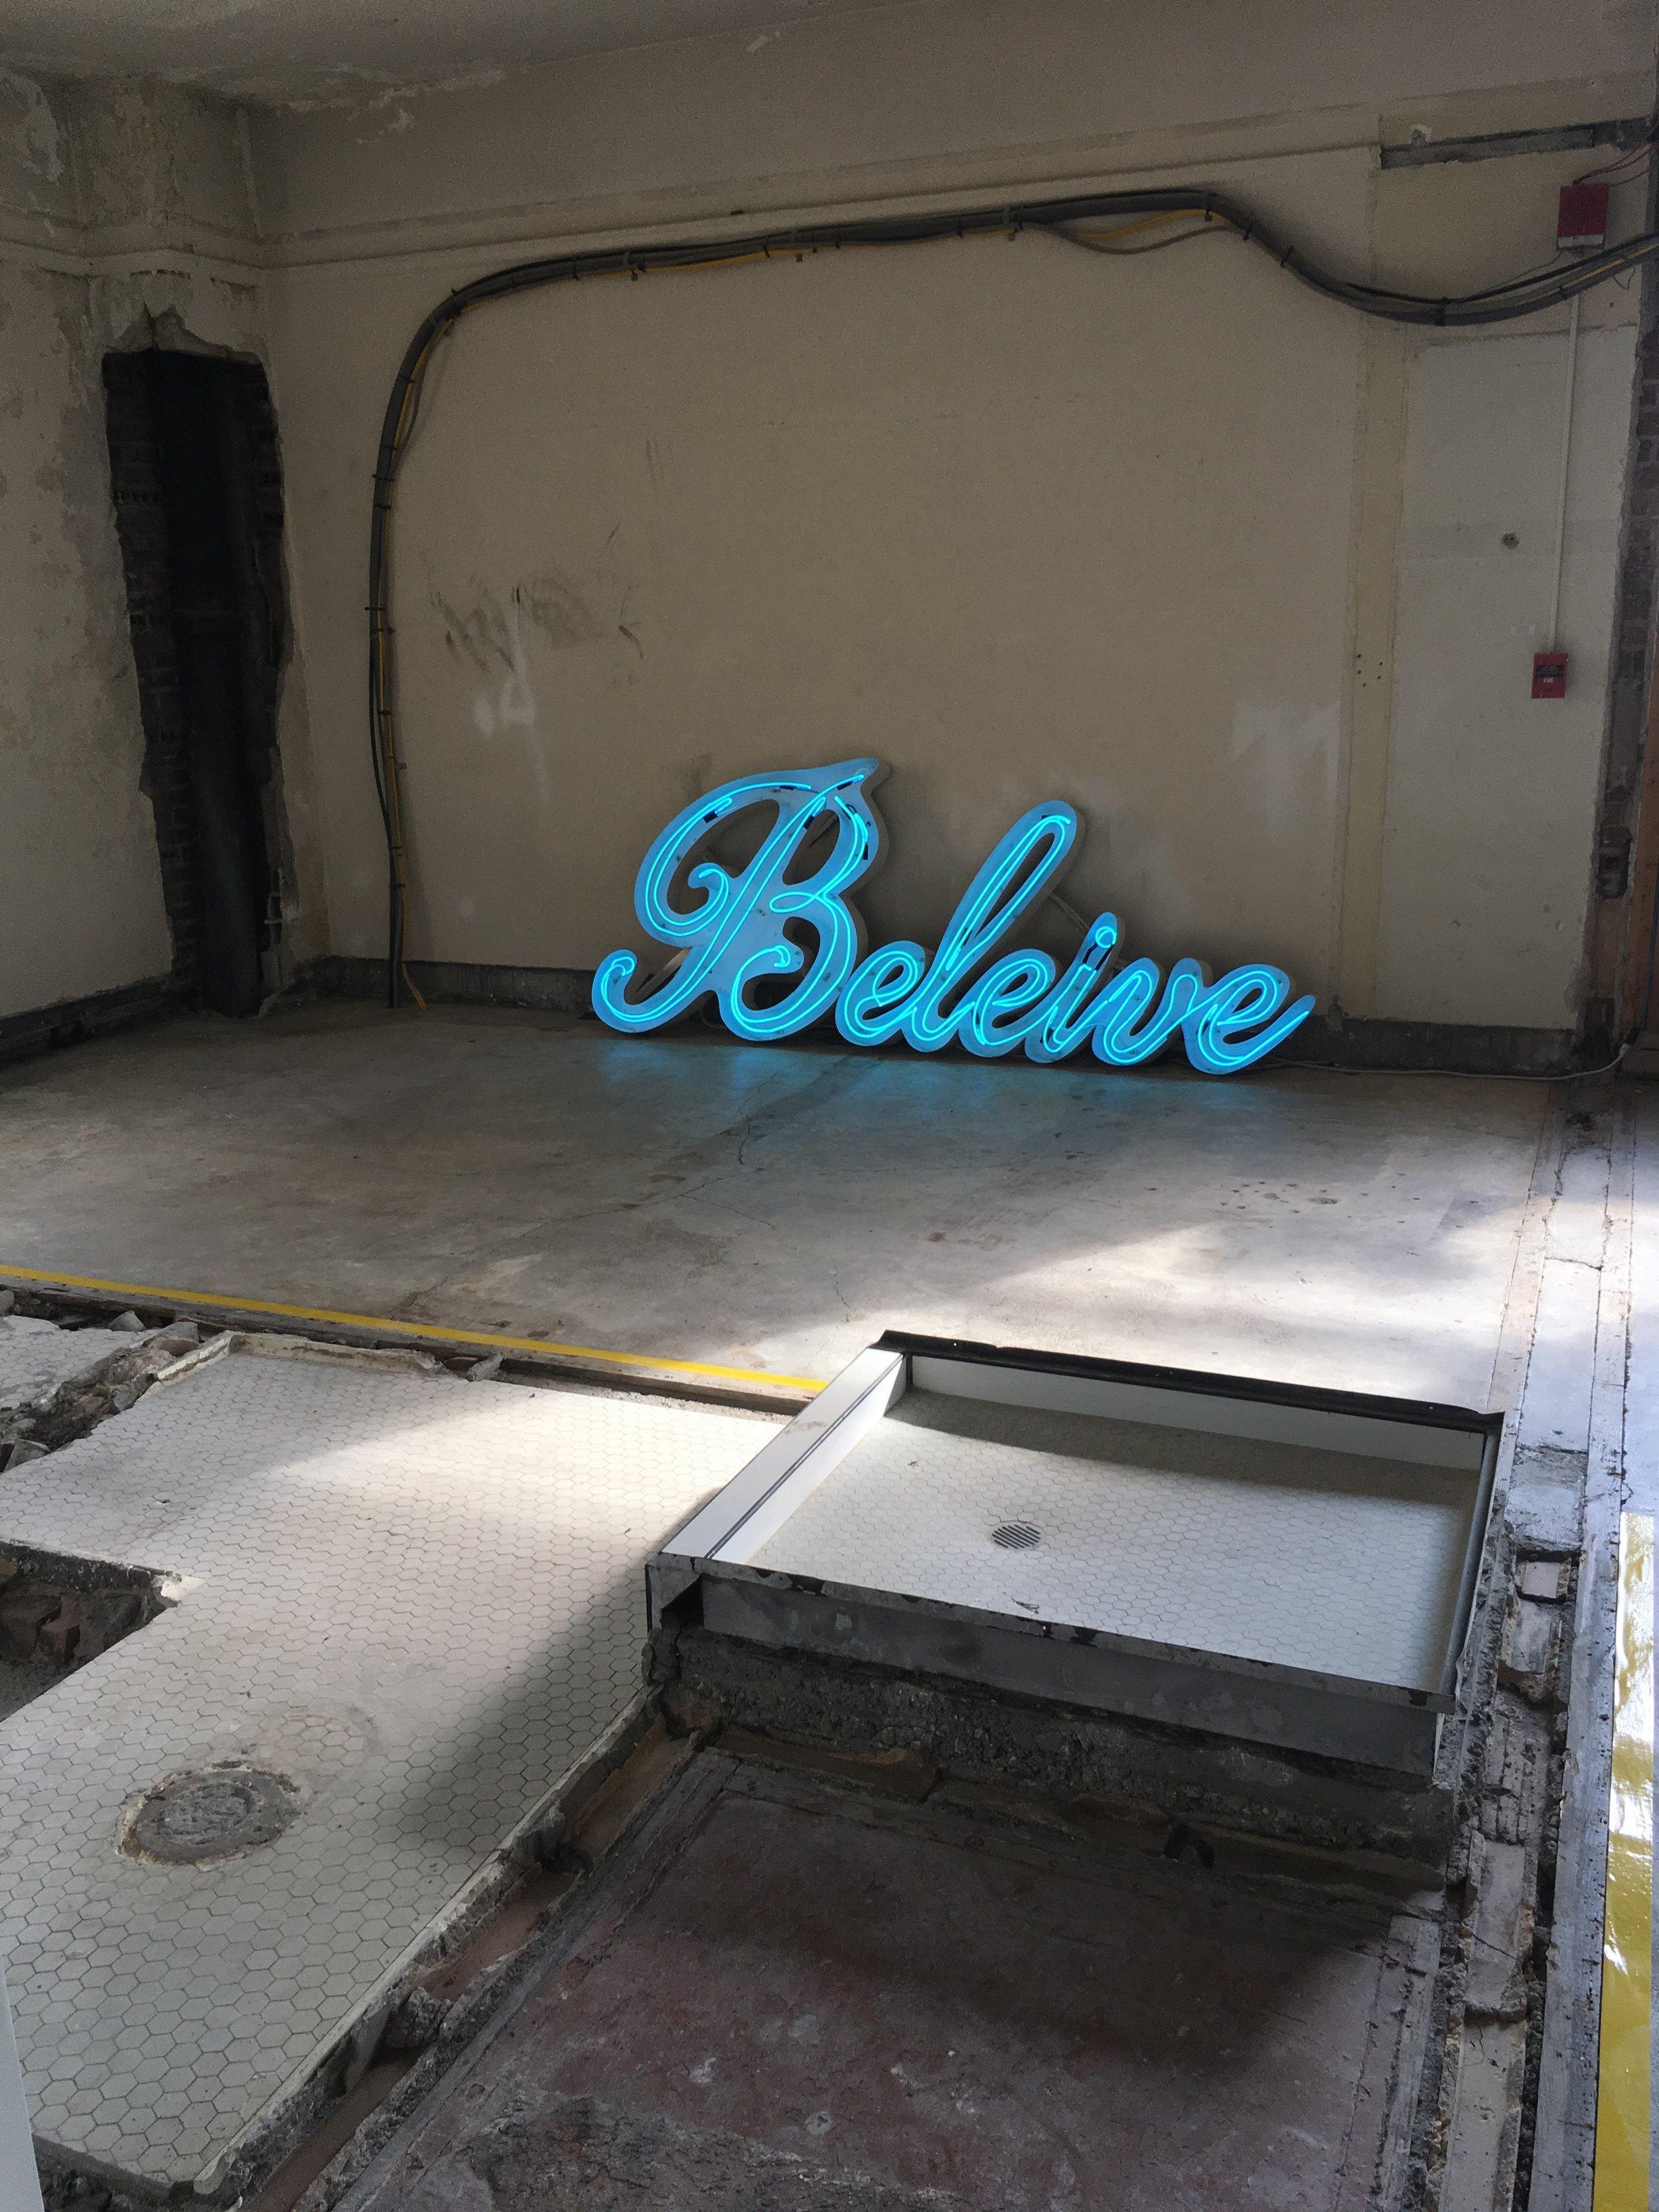 Zac Weinberg's , 'Believe', 2016. Neon, Metal. Dimensions Unknown.